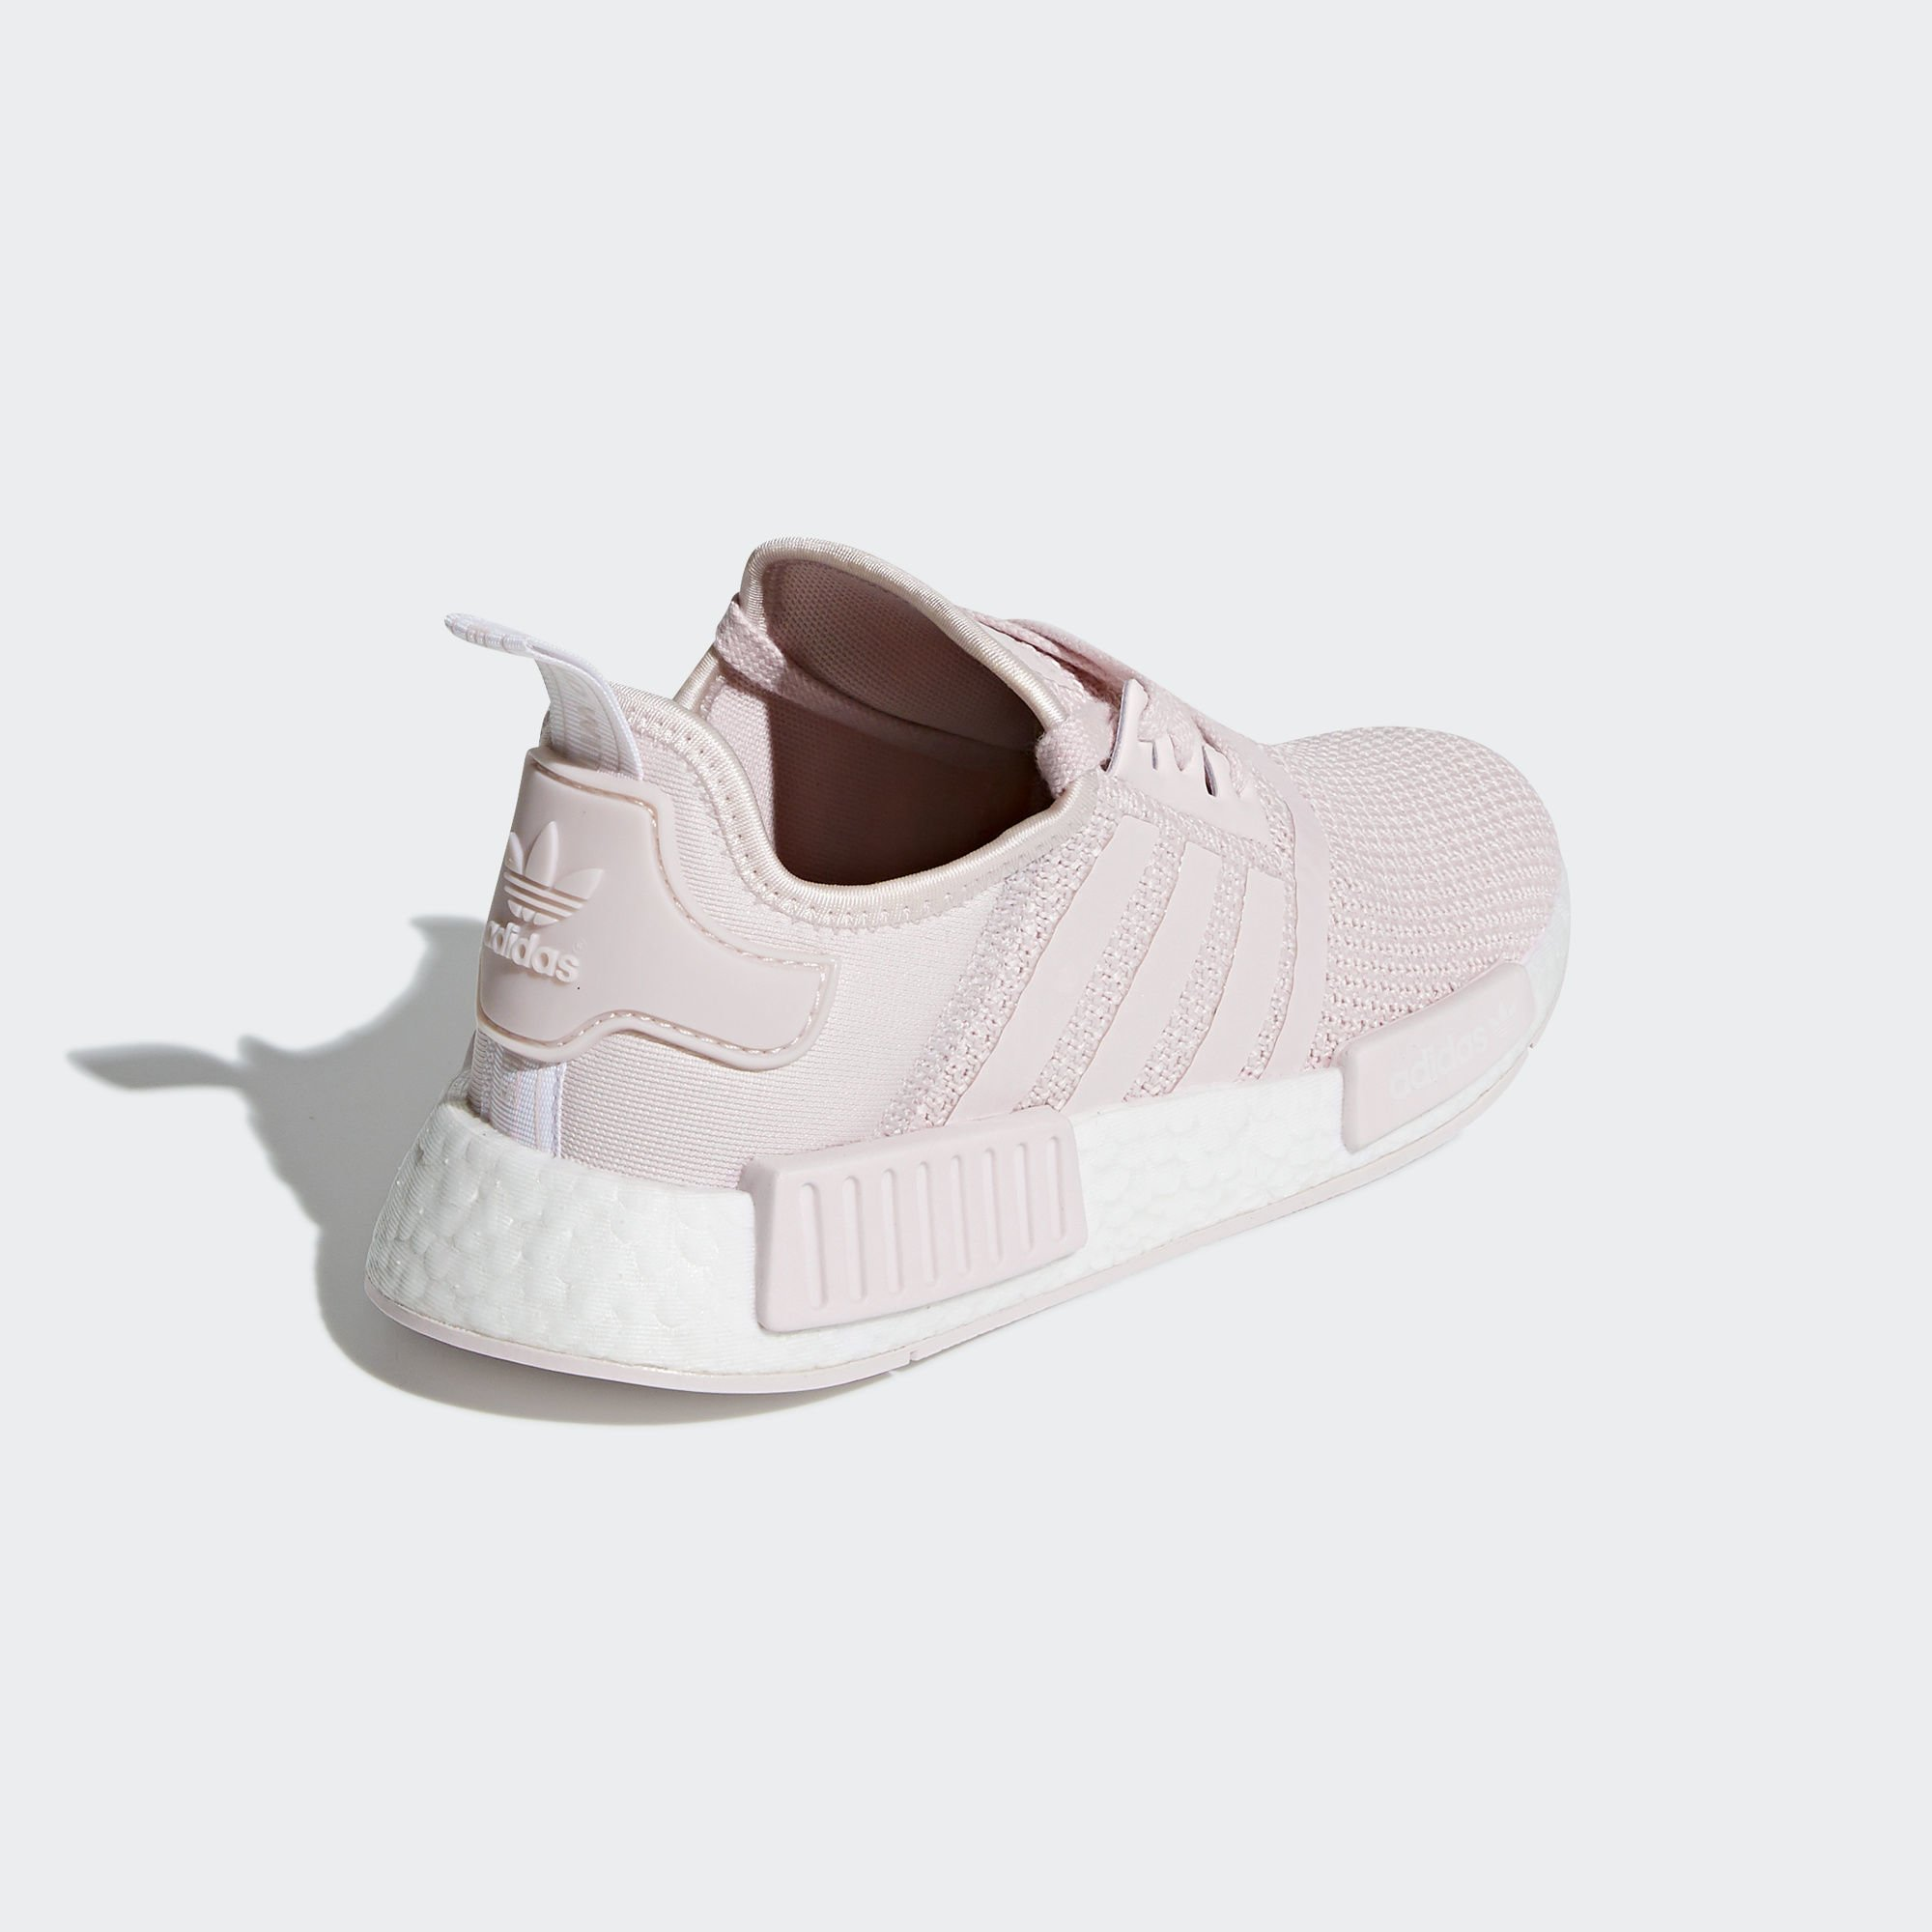 adidas NMD_R1 'Pink' (B37652)